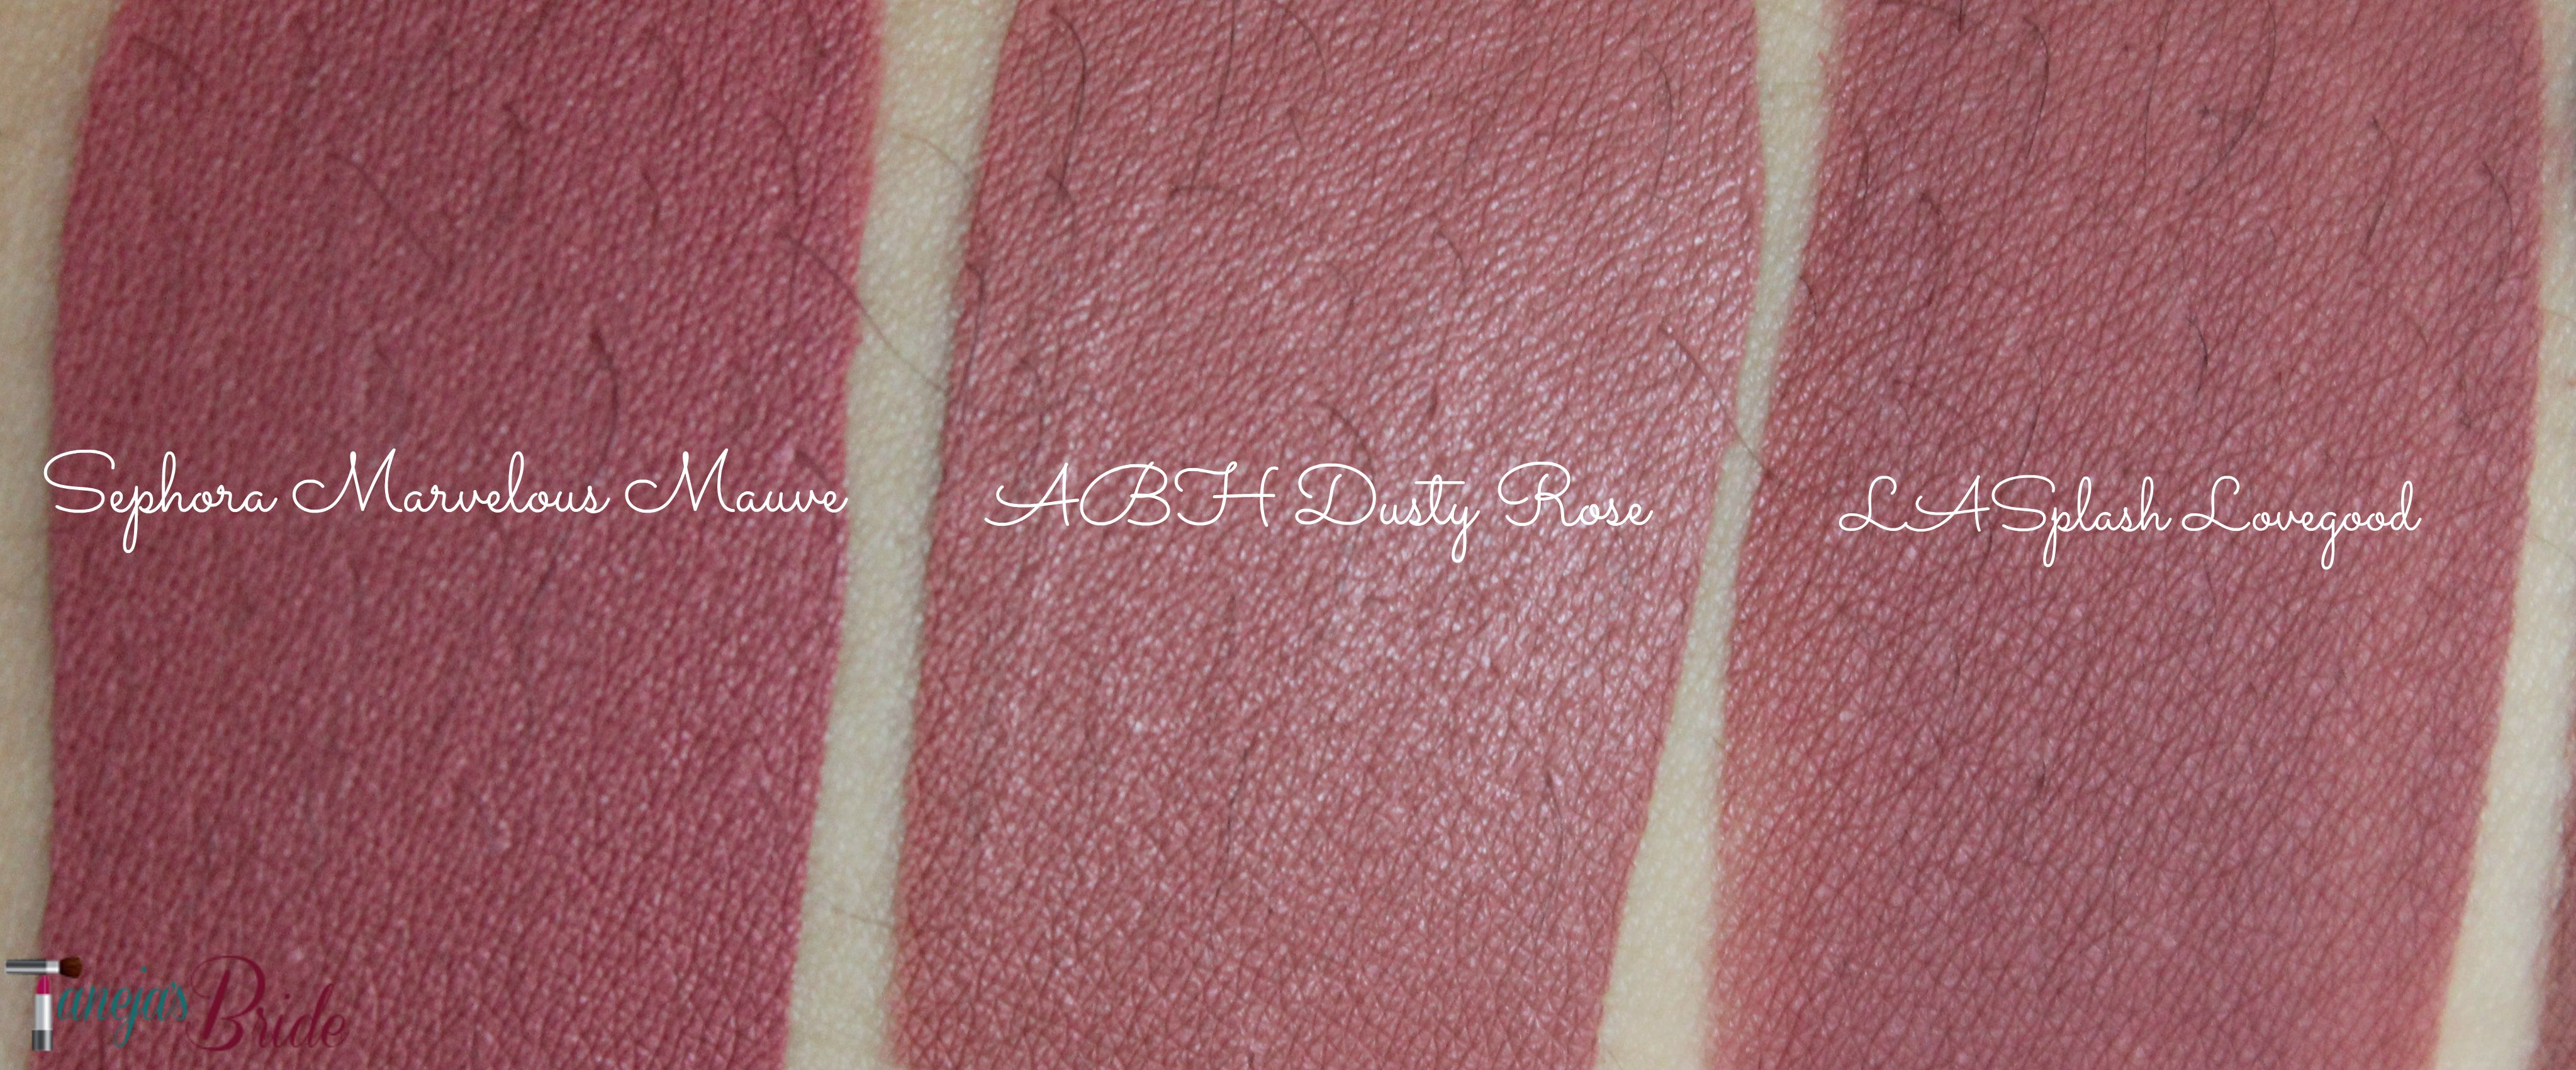 lasplash cosmetics harry potter : Target